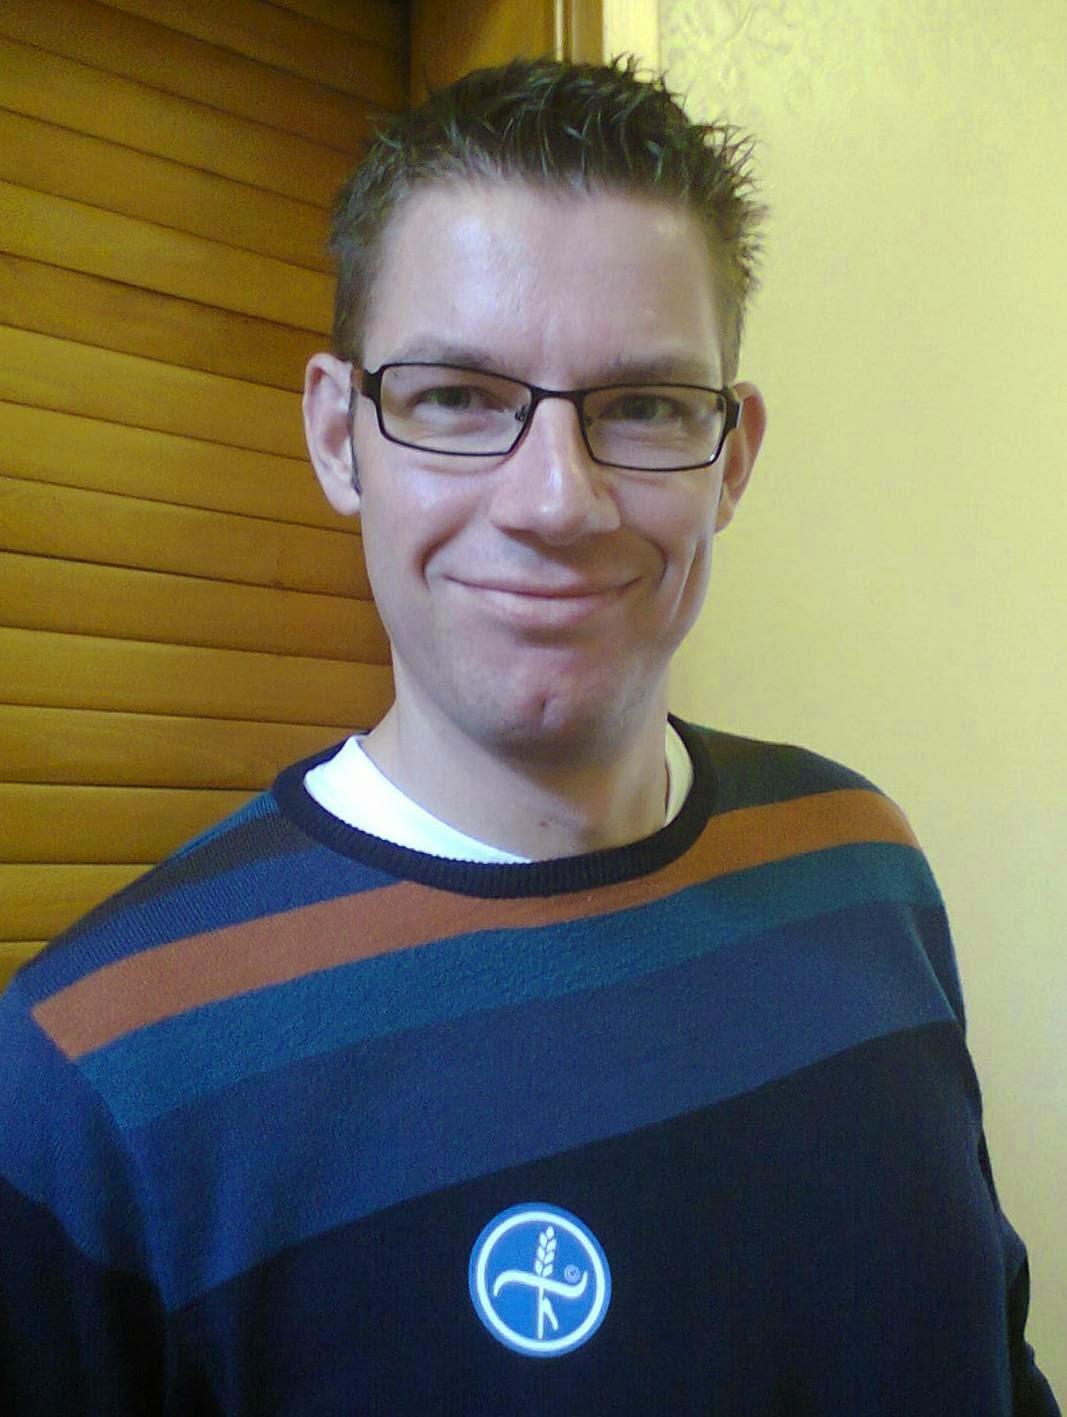 Richard Gottfried - Coeliac. Living gluten free since May 2008